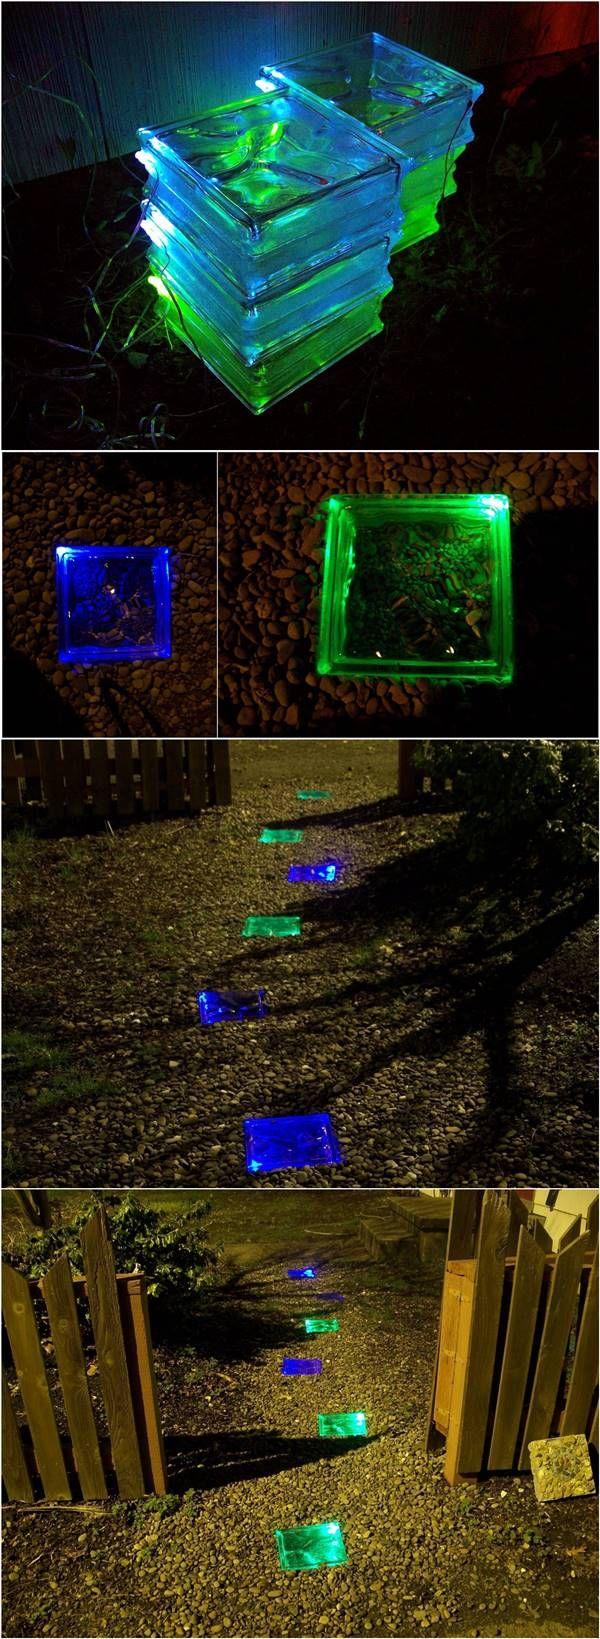 How to Make Colored Solar Powered Walkway #garden #path #decor #walkway